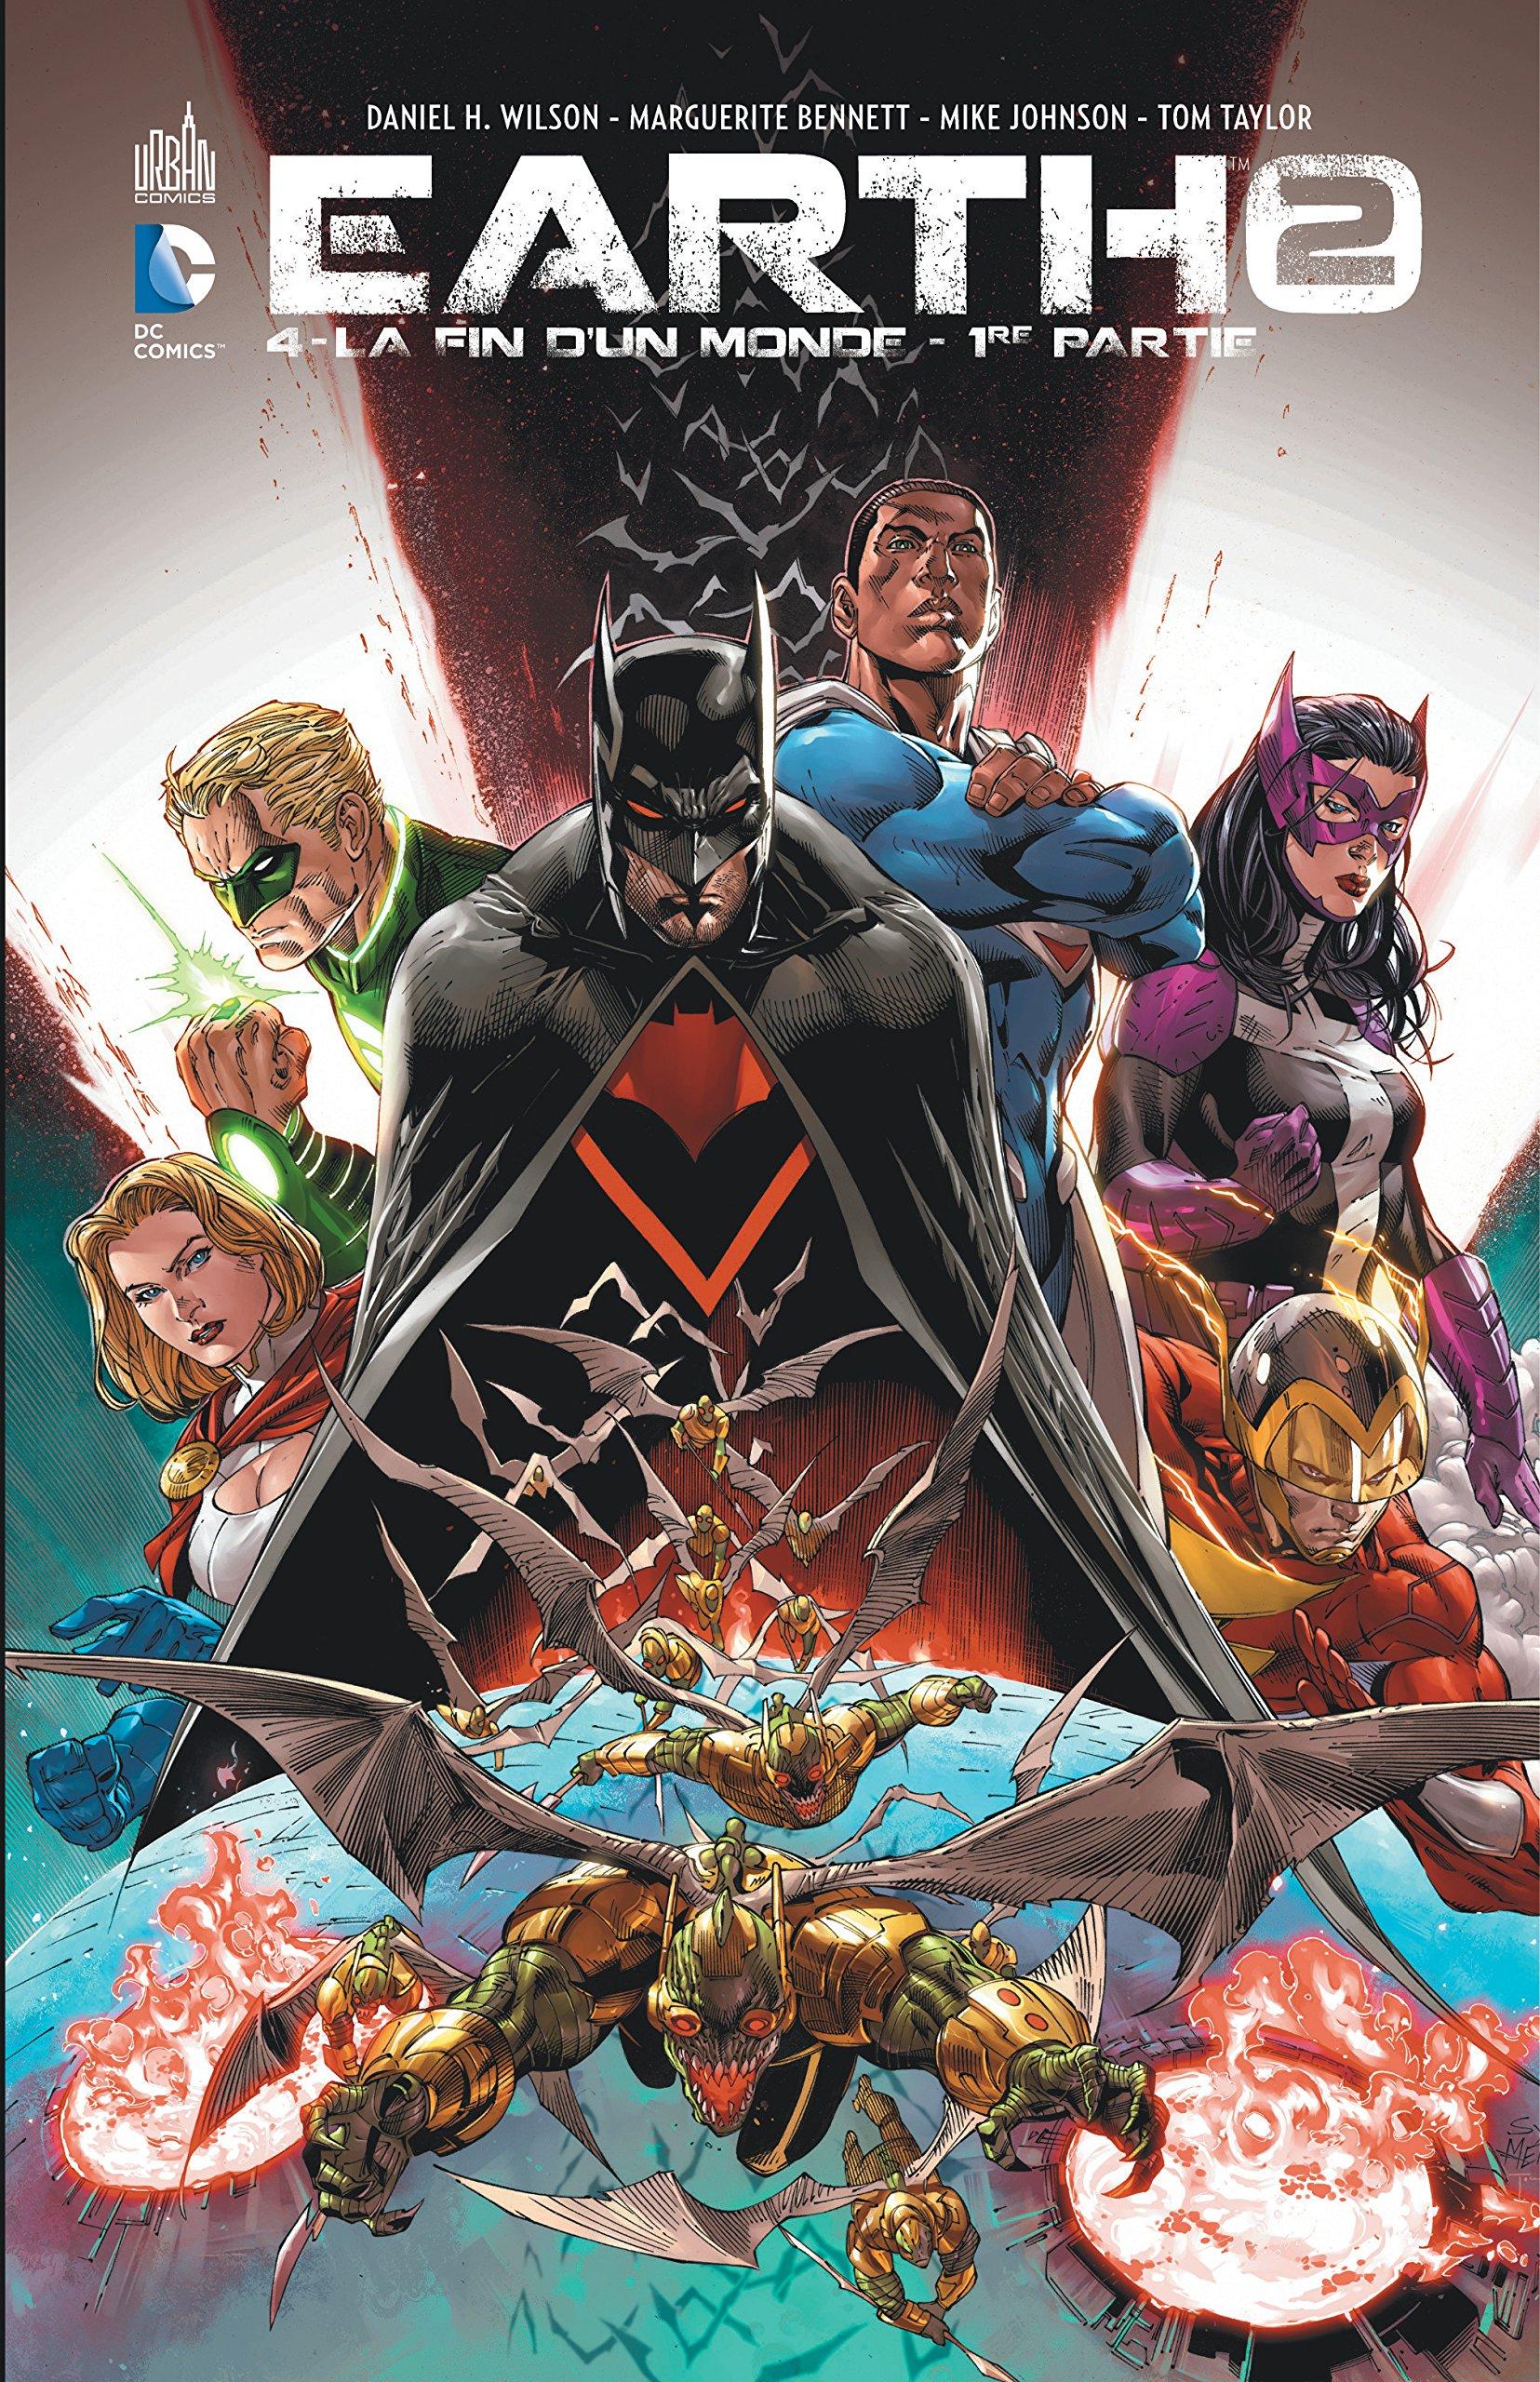 Earth 2 Tome 4 Relié – 29 avril 2016 Collectif Urban Comics 2365778674 Comics & mangas